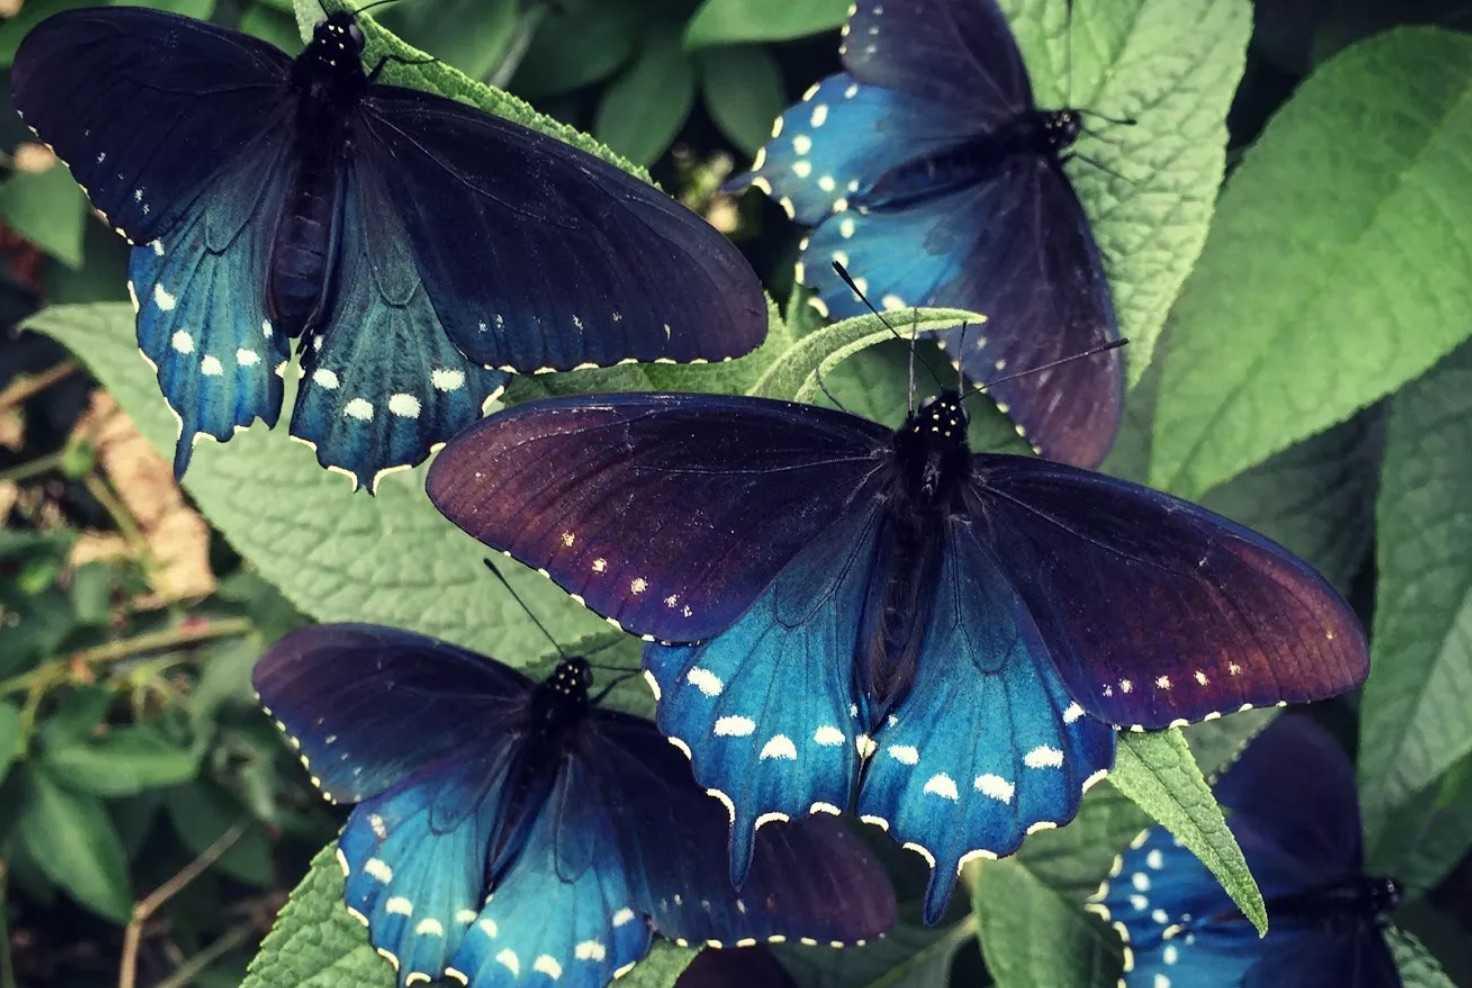 Упражнение бабочка: техника для женщин и мужчин, влияние на похудение живота и боков